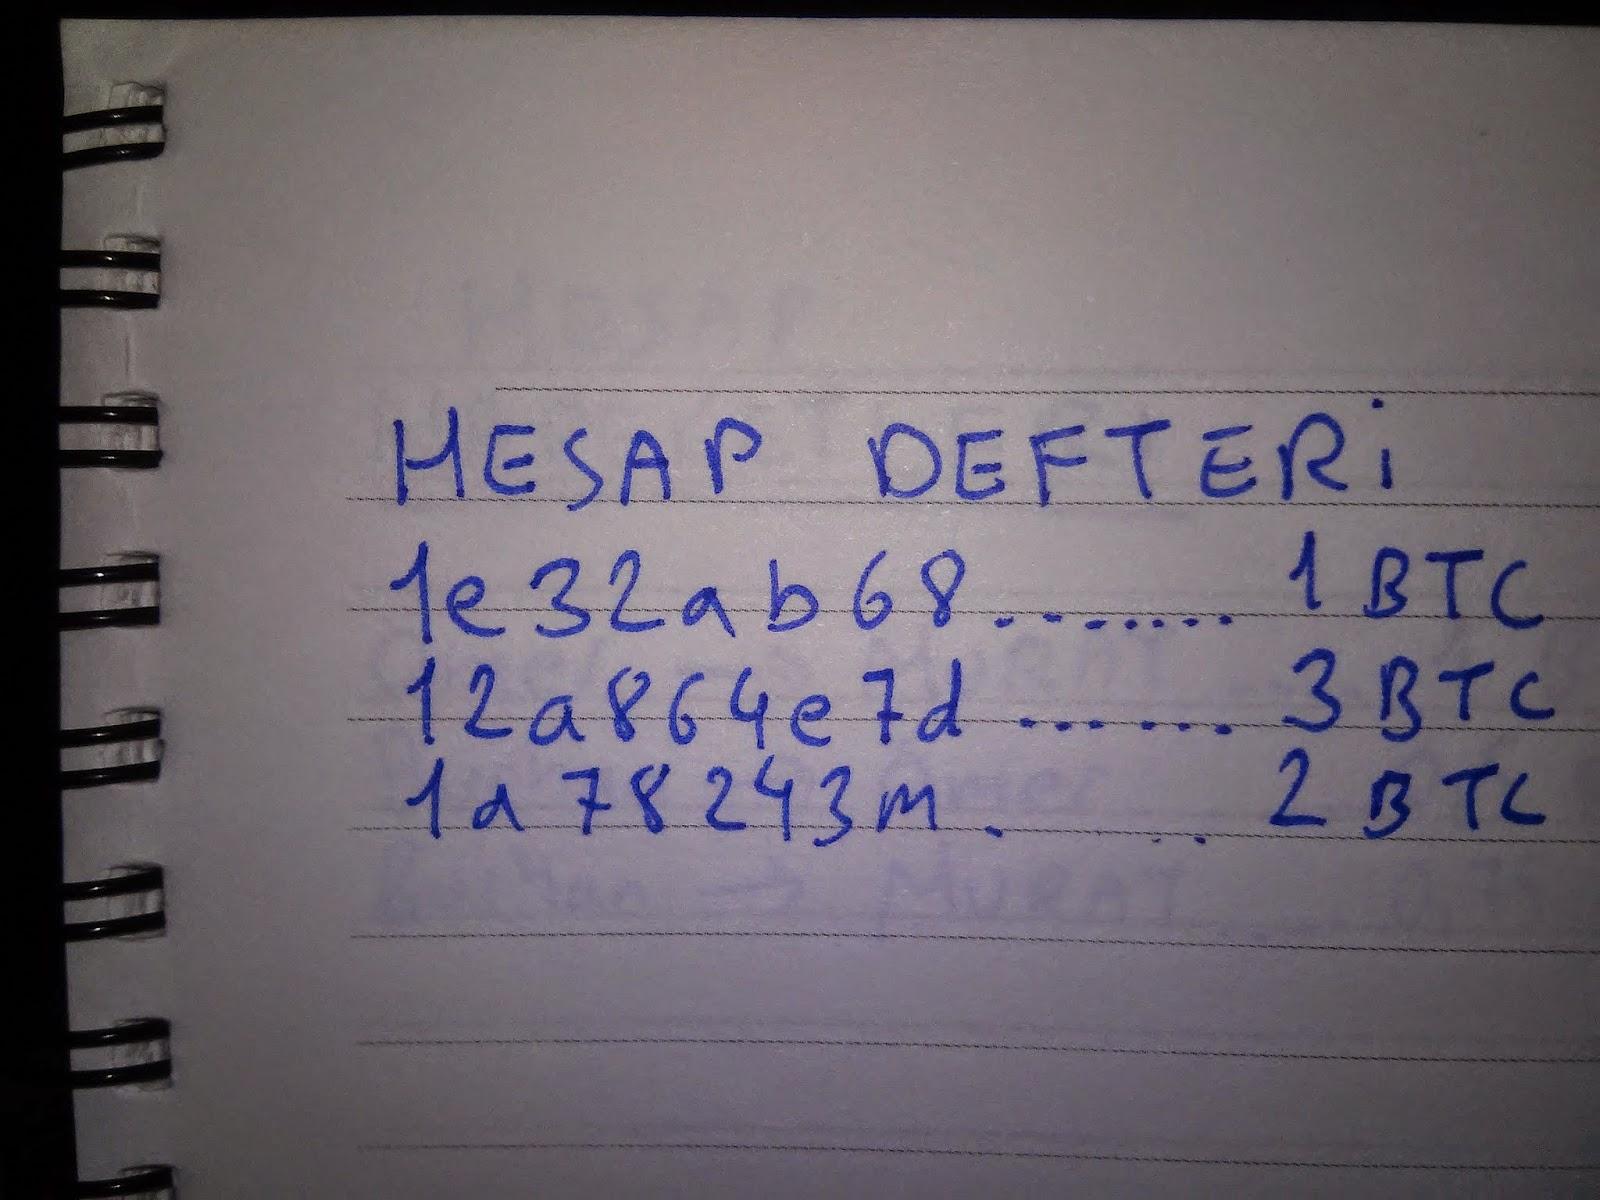 bitcoin-hesap-defteri-2-adresler